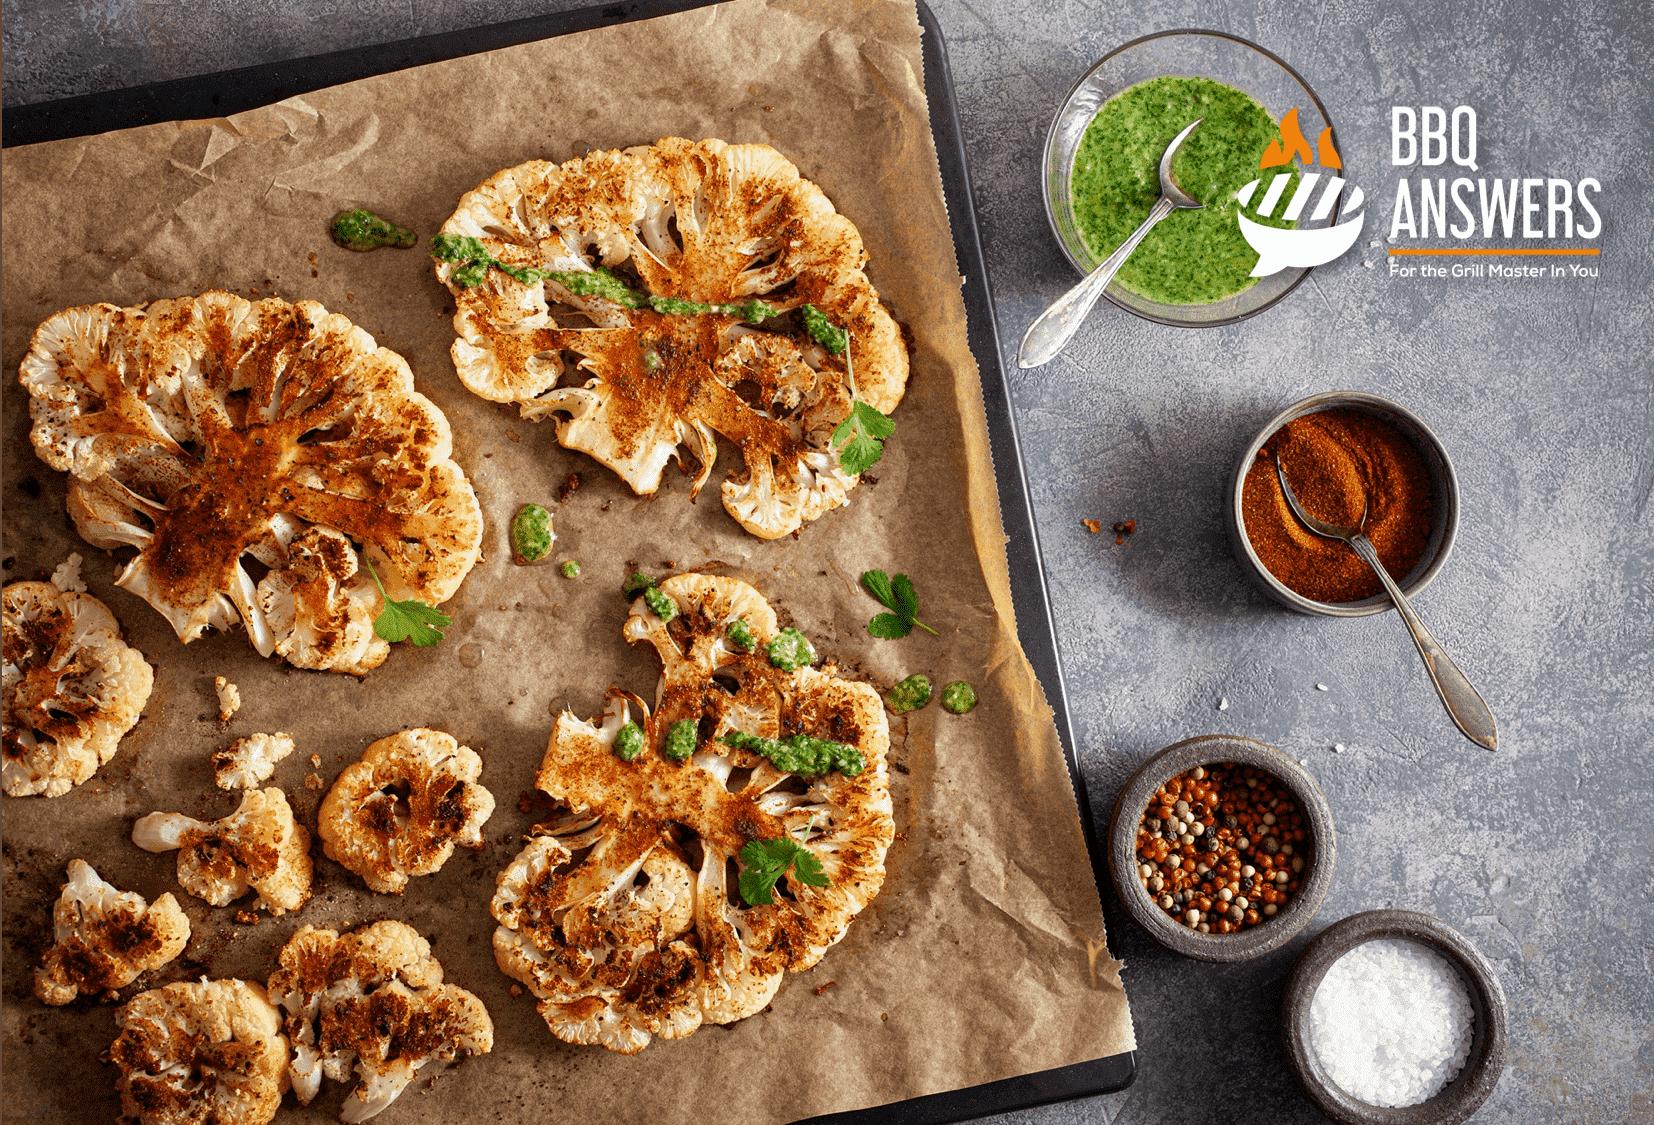 Vegan Cauliflower Chips | Vegan BBQ Sides | BBQanswers